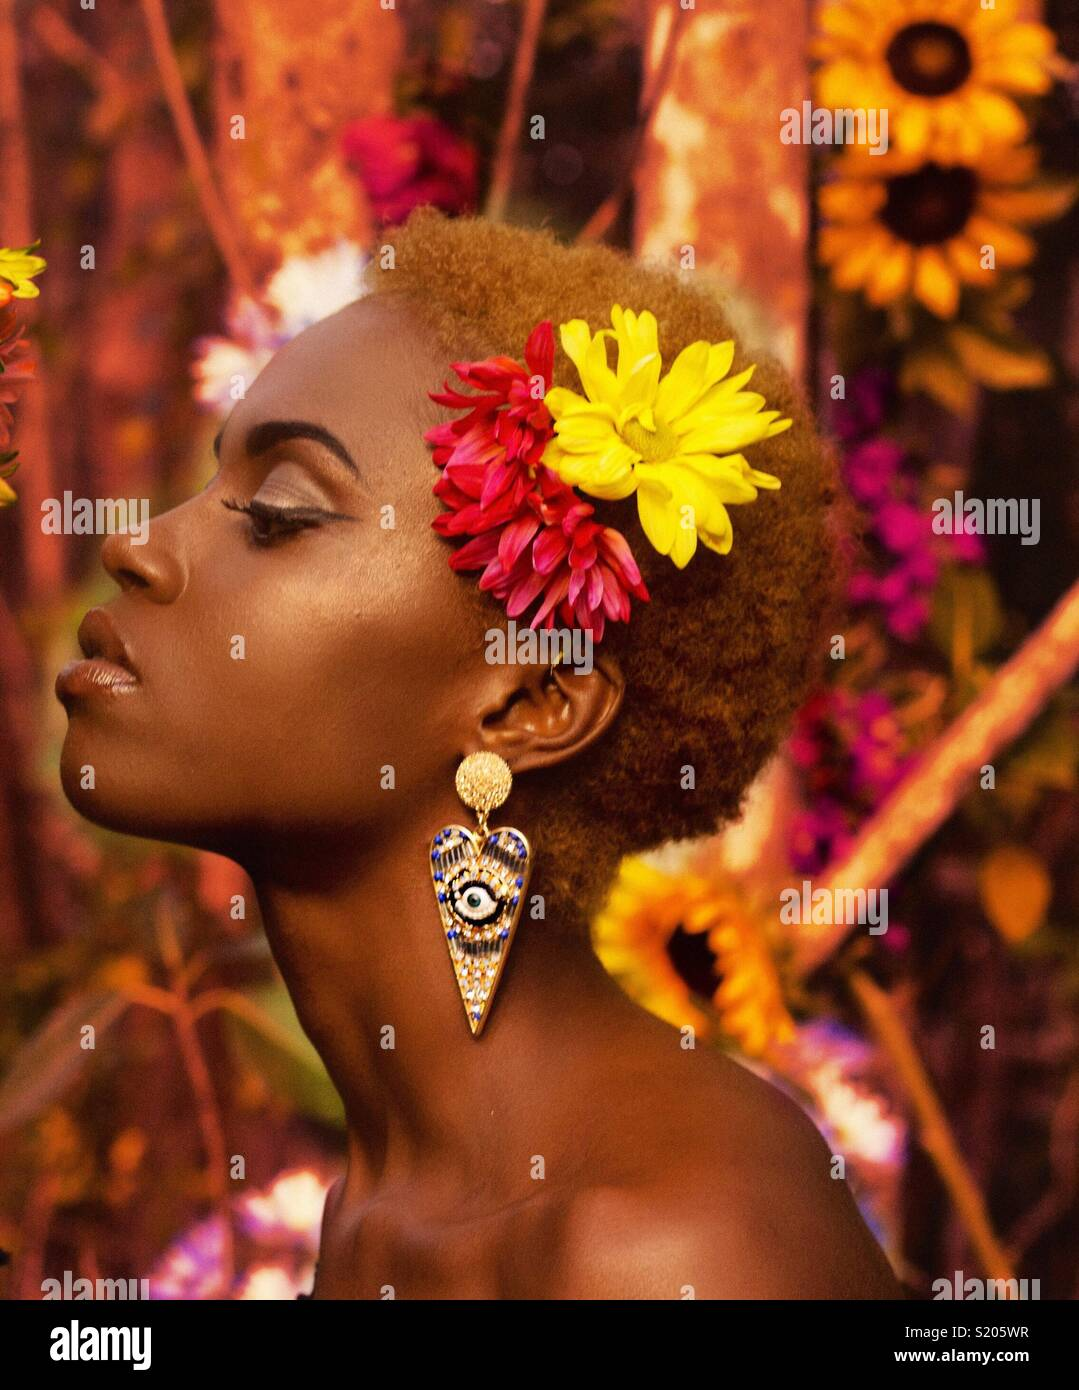 Femme fleur Photo Stock